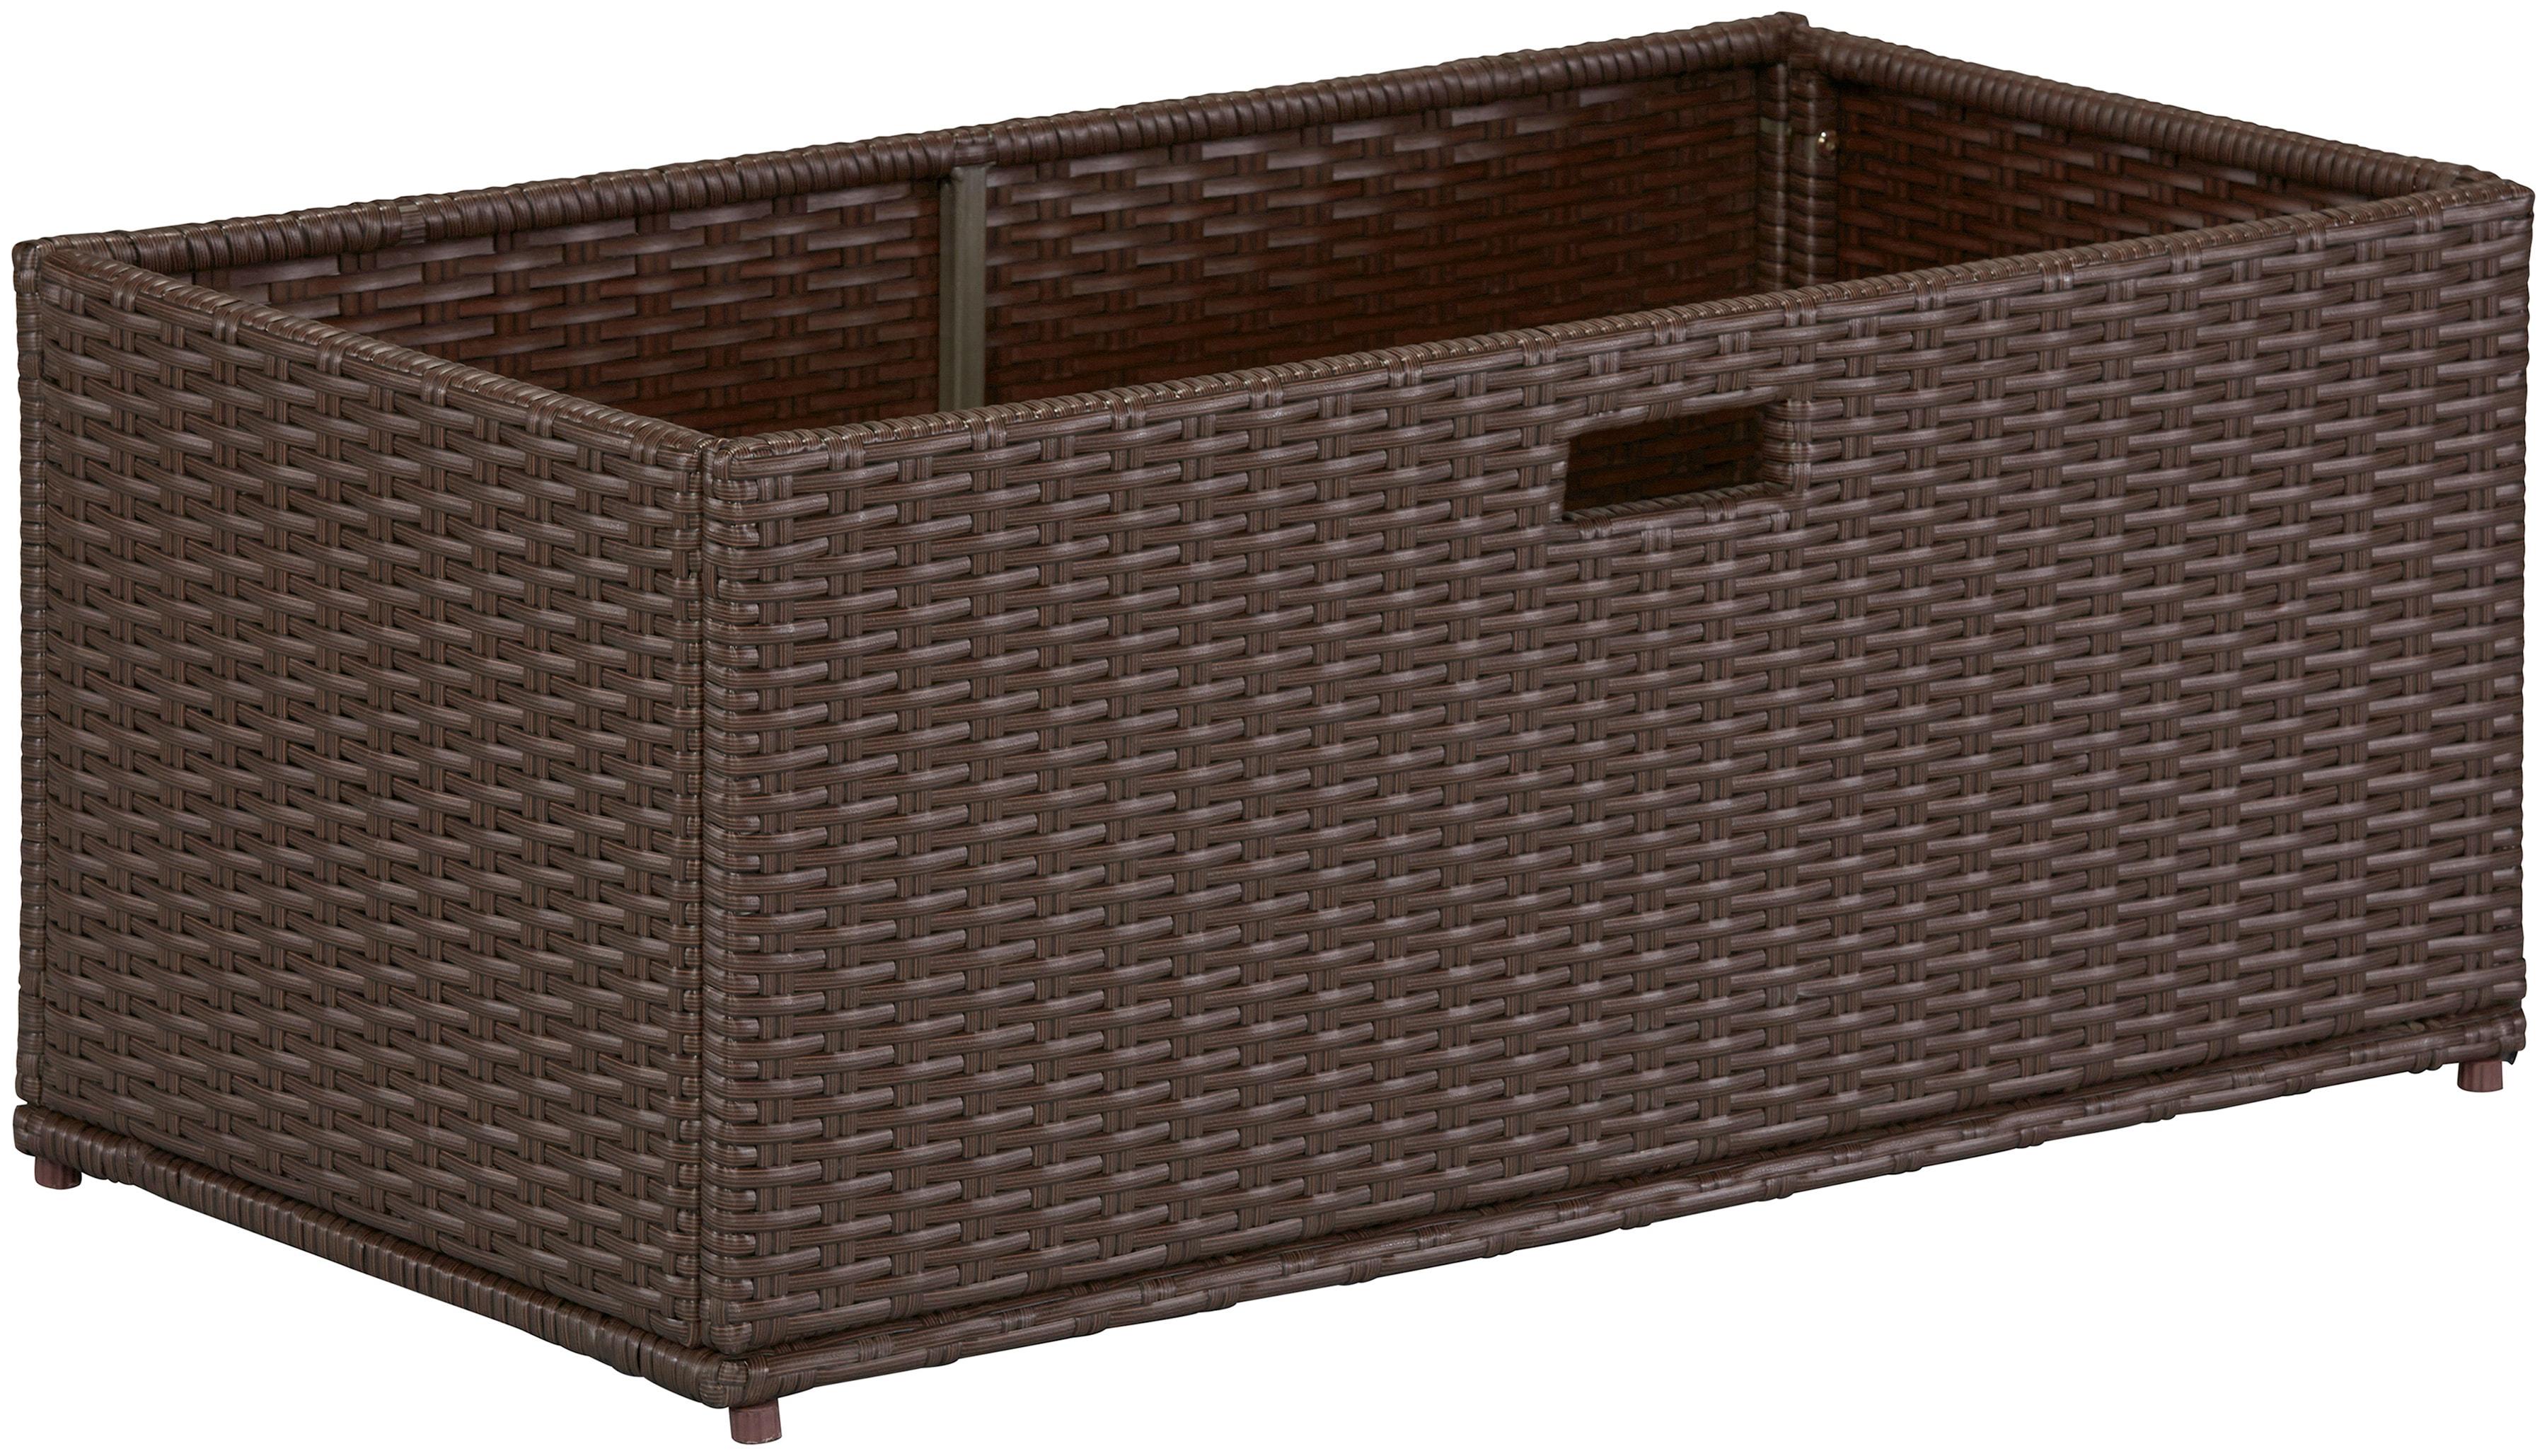 Image of Auflagenbox, (B/H/T): ca. 95x39x49 cm, Polyrattan, braun